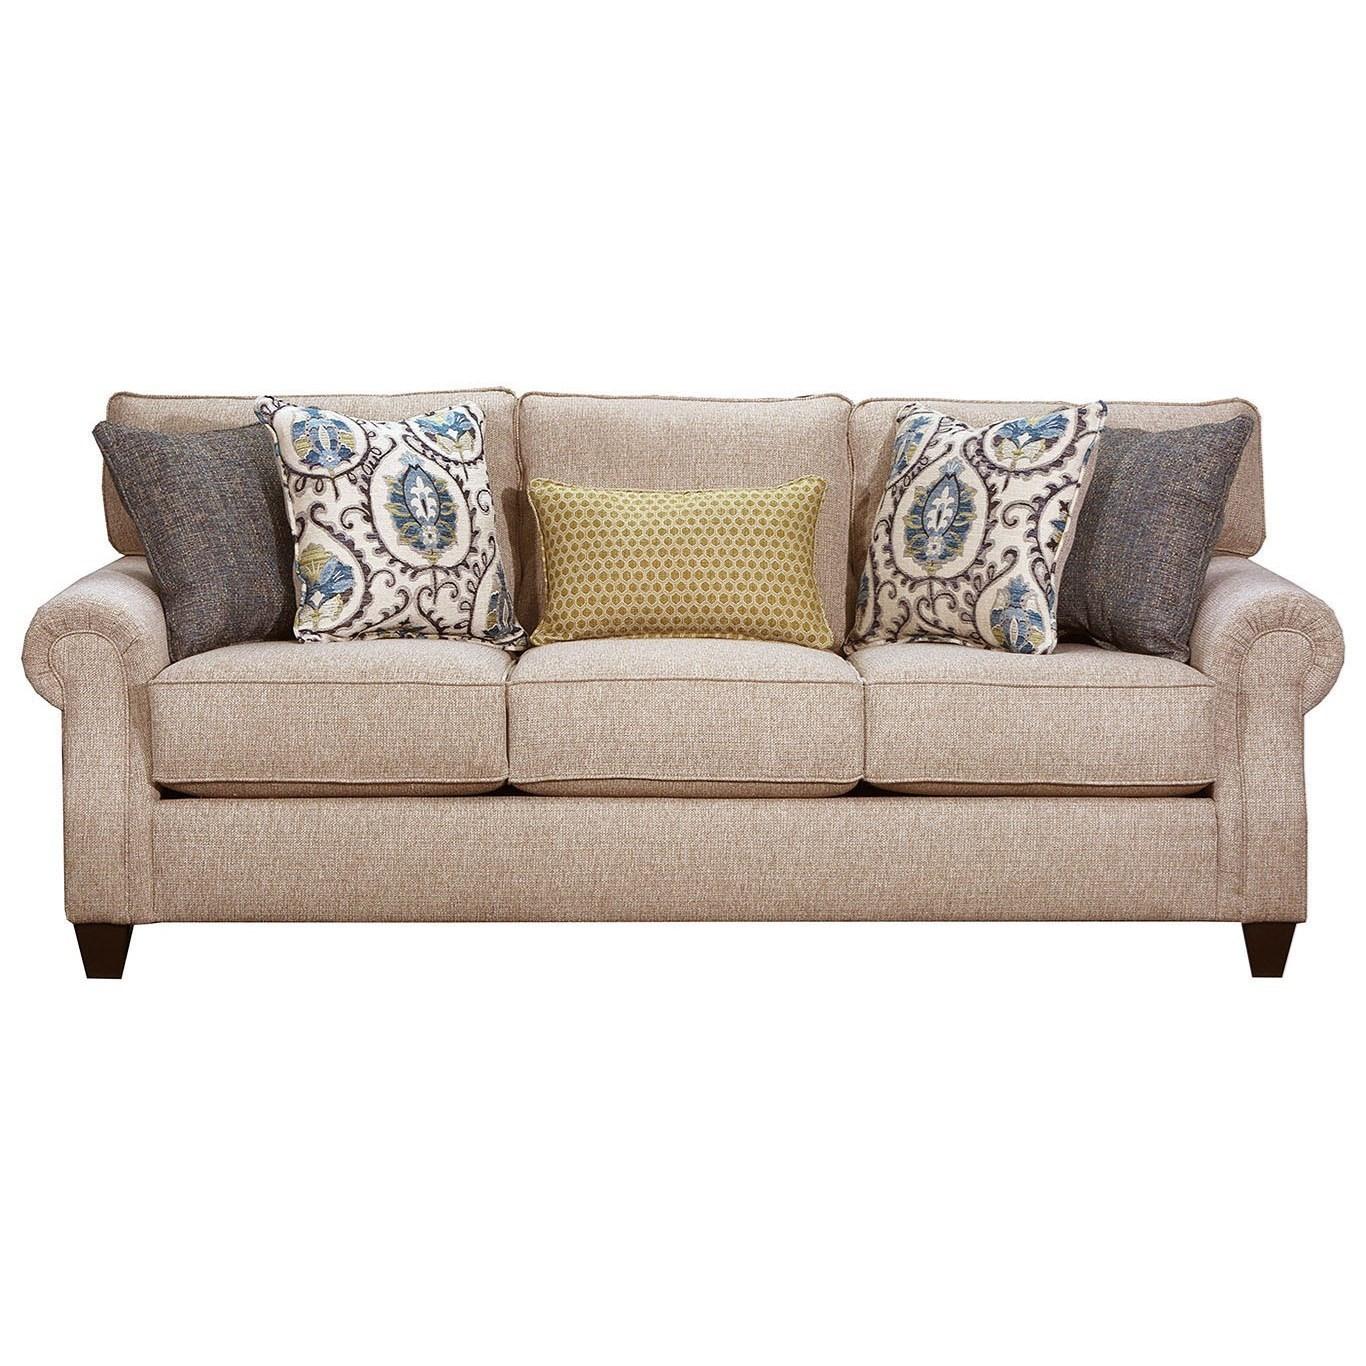 8010 Sofa by Lane at Esprit Decor Home Furnishings